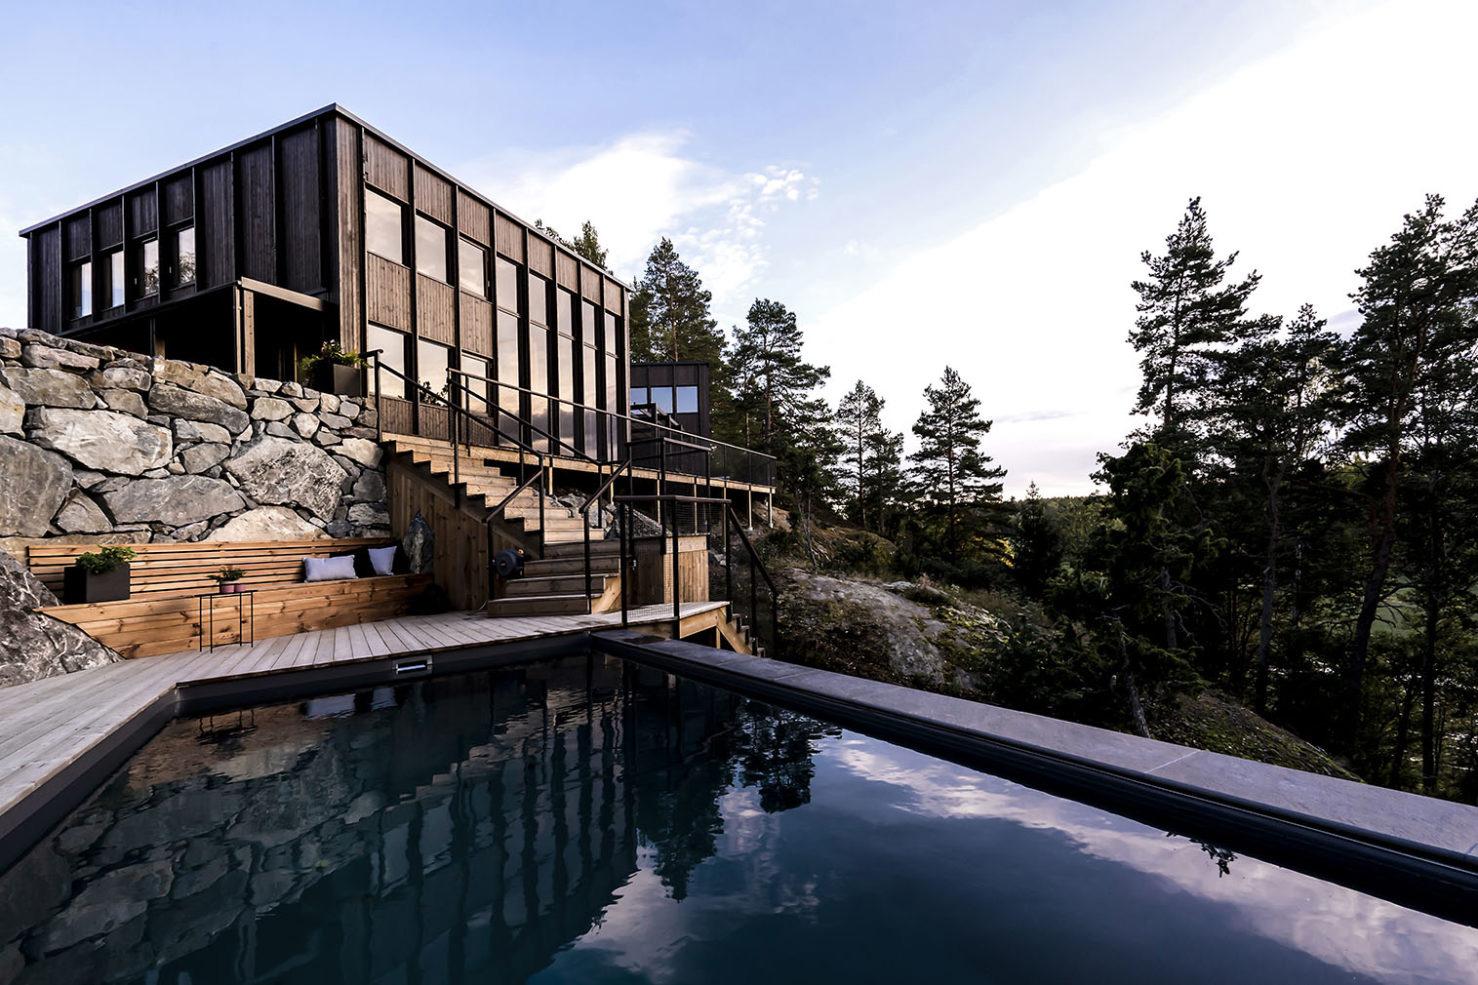 Property for sale on the Stockholm archipelago